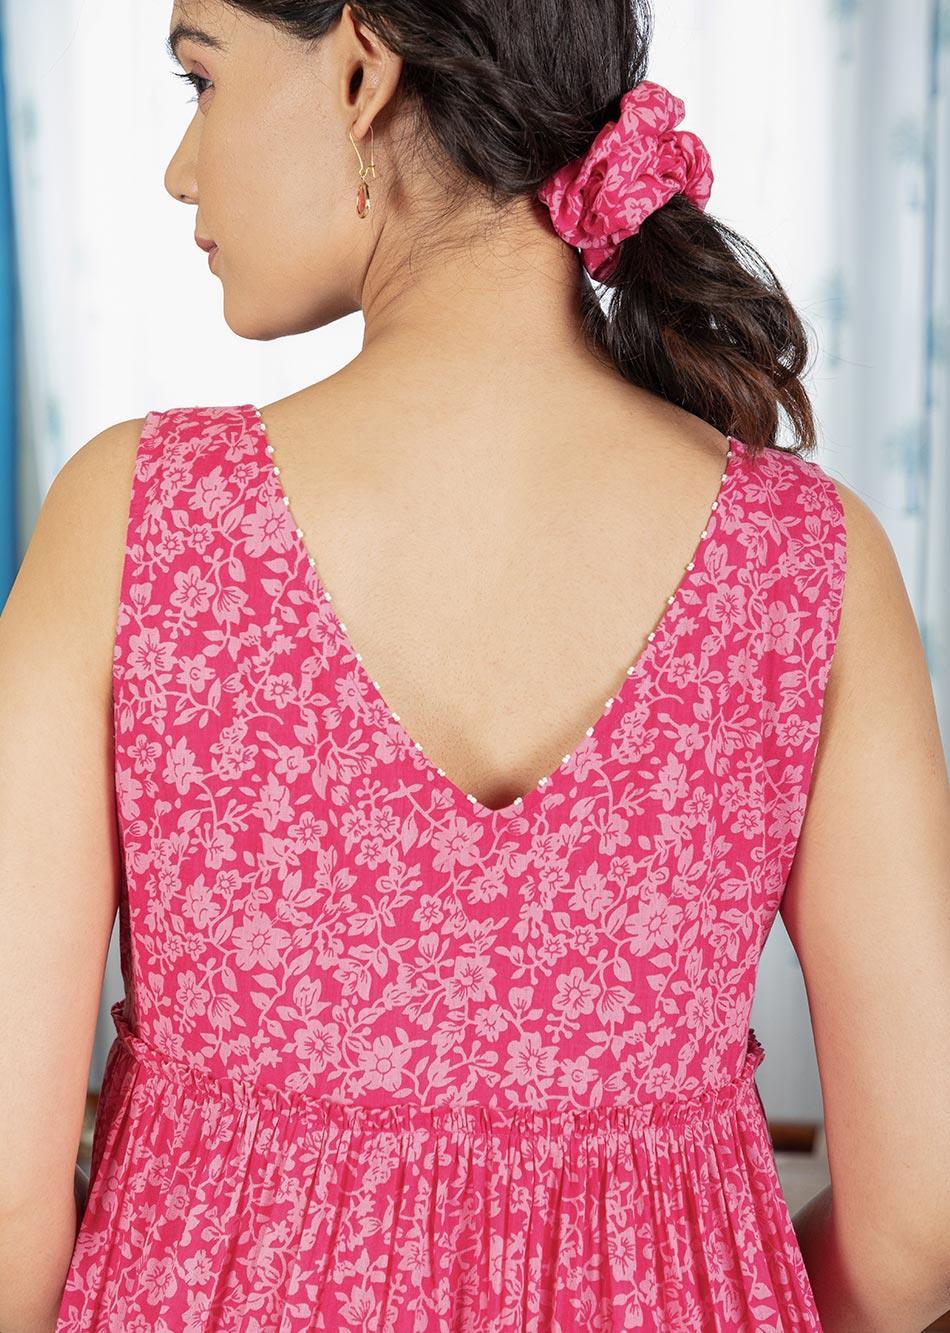 PINK WINK DRESS By Jovi Fashion